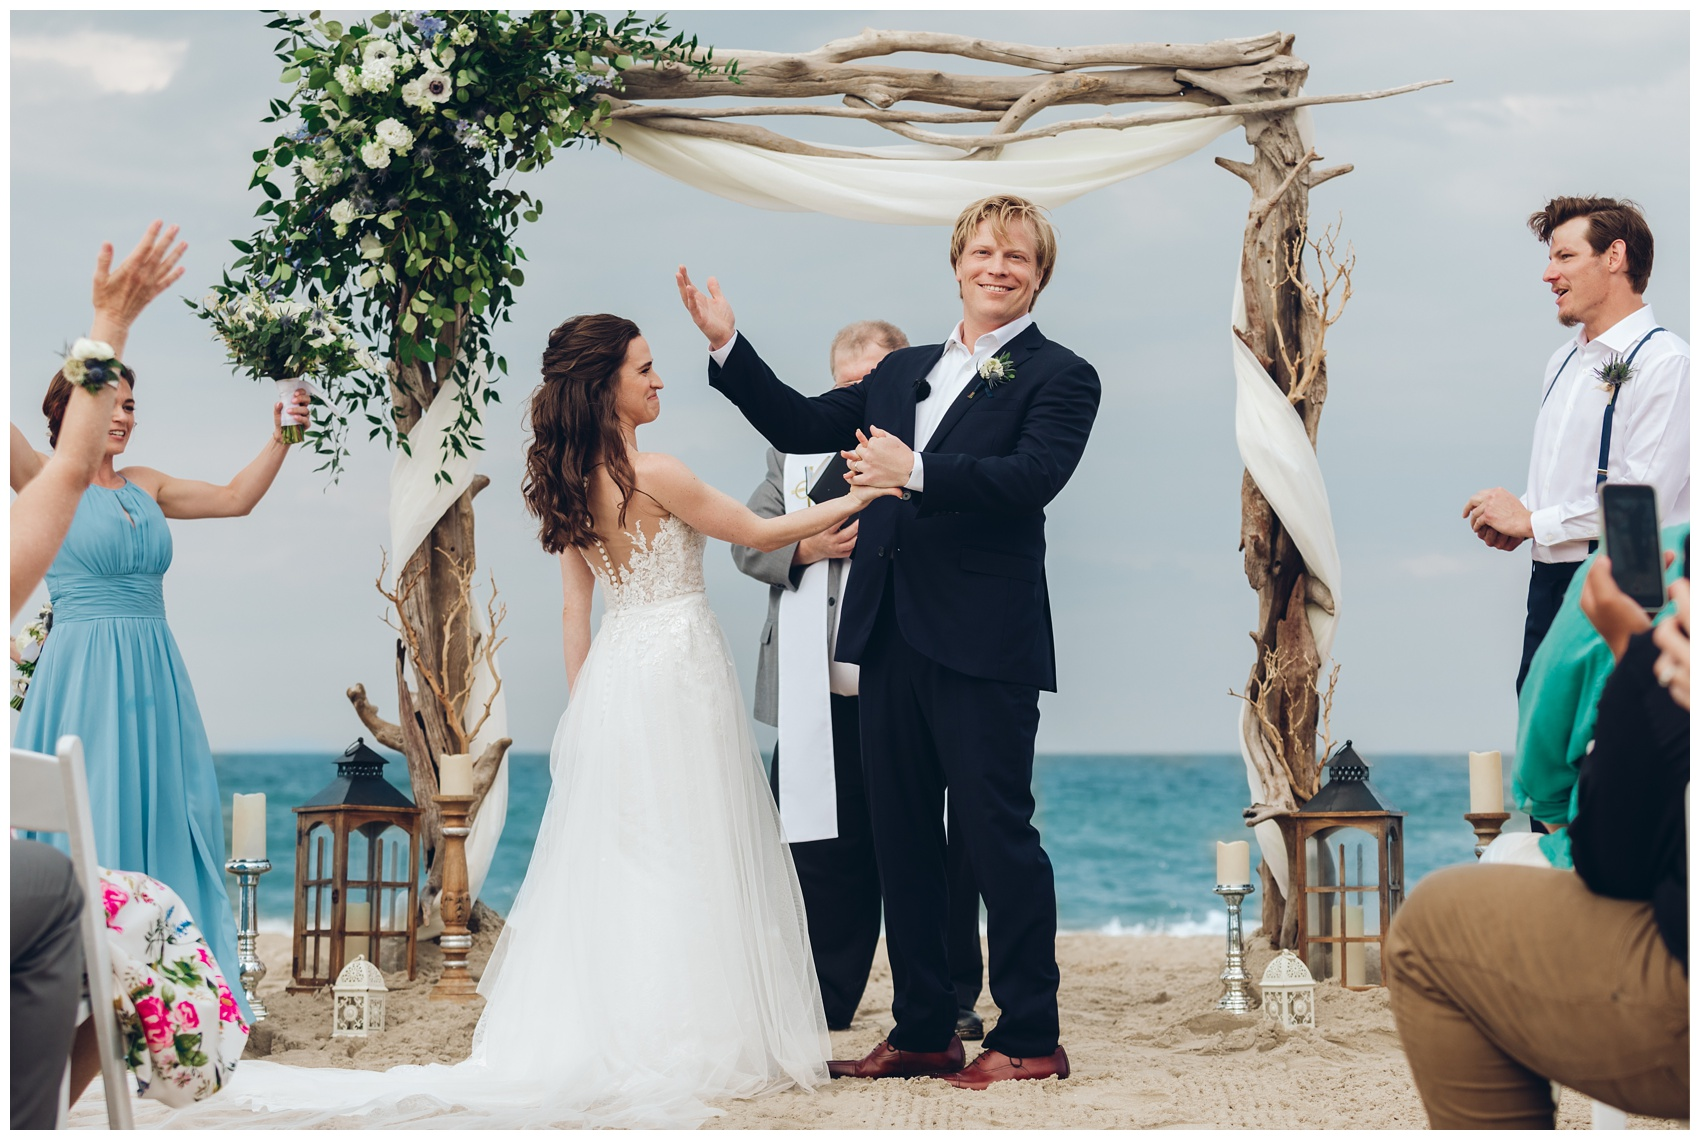 Outer-Banks-Corolla-Wedding_0066.jpg